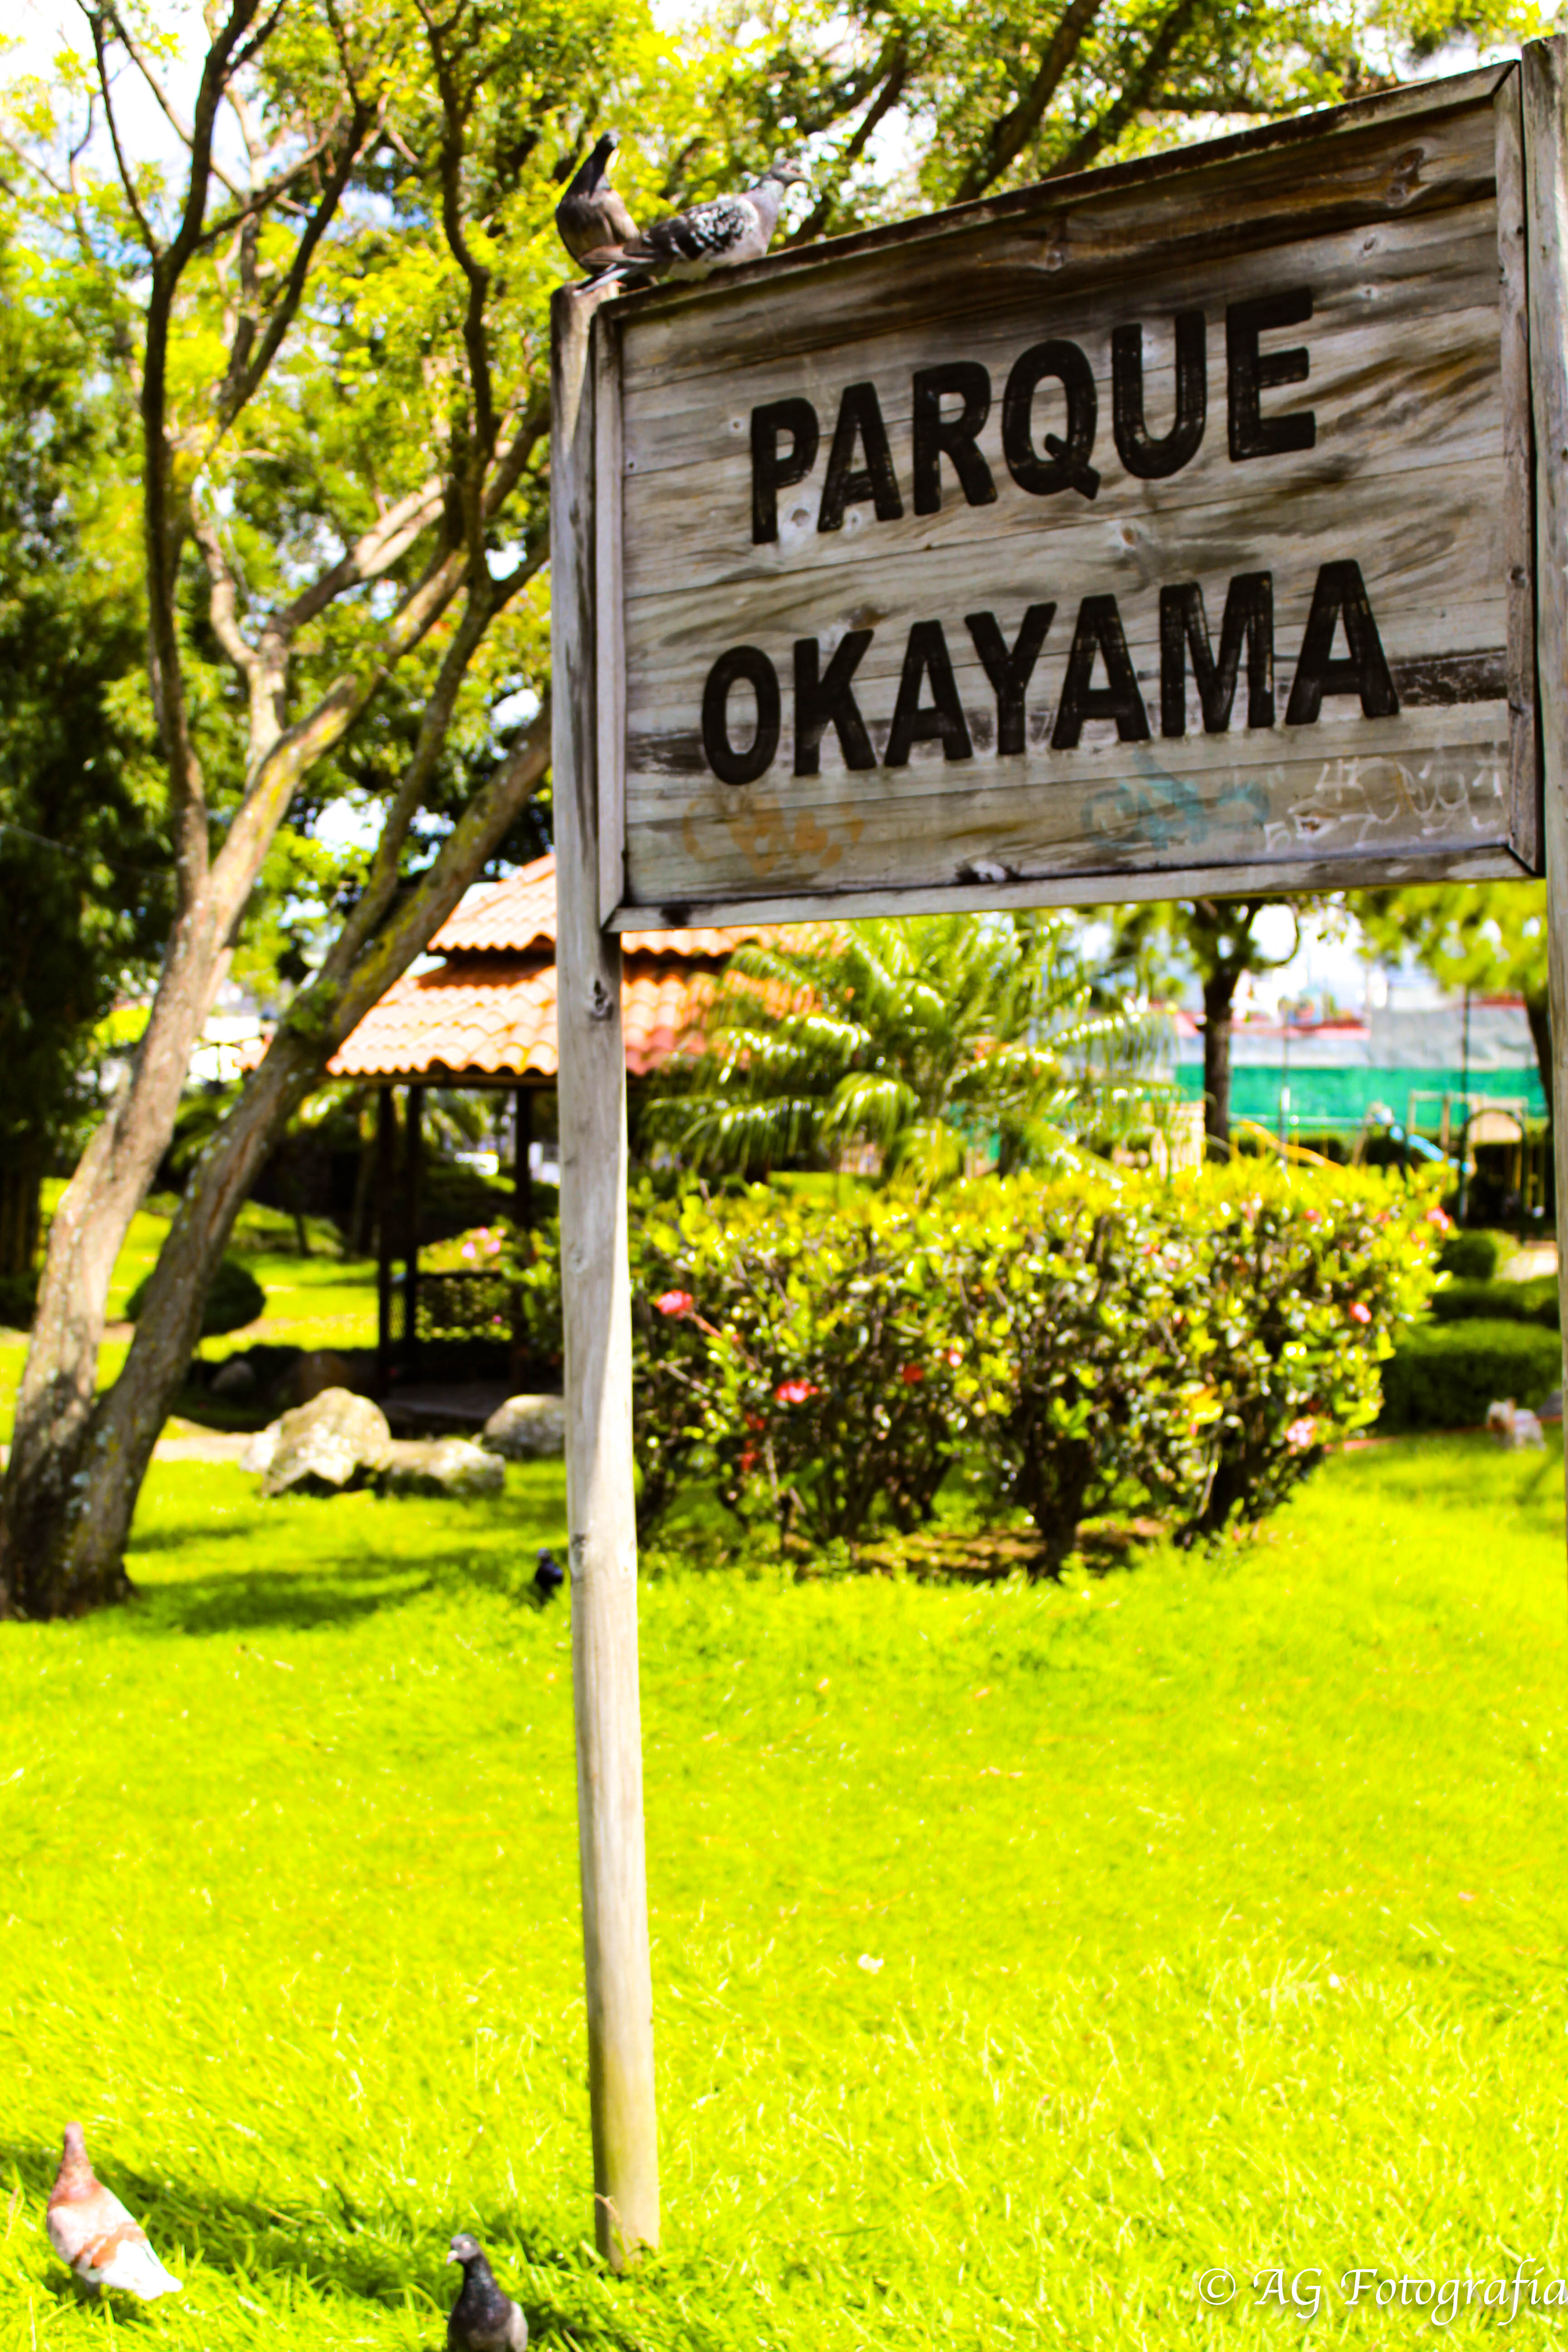 Parque Okayama